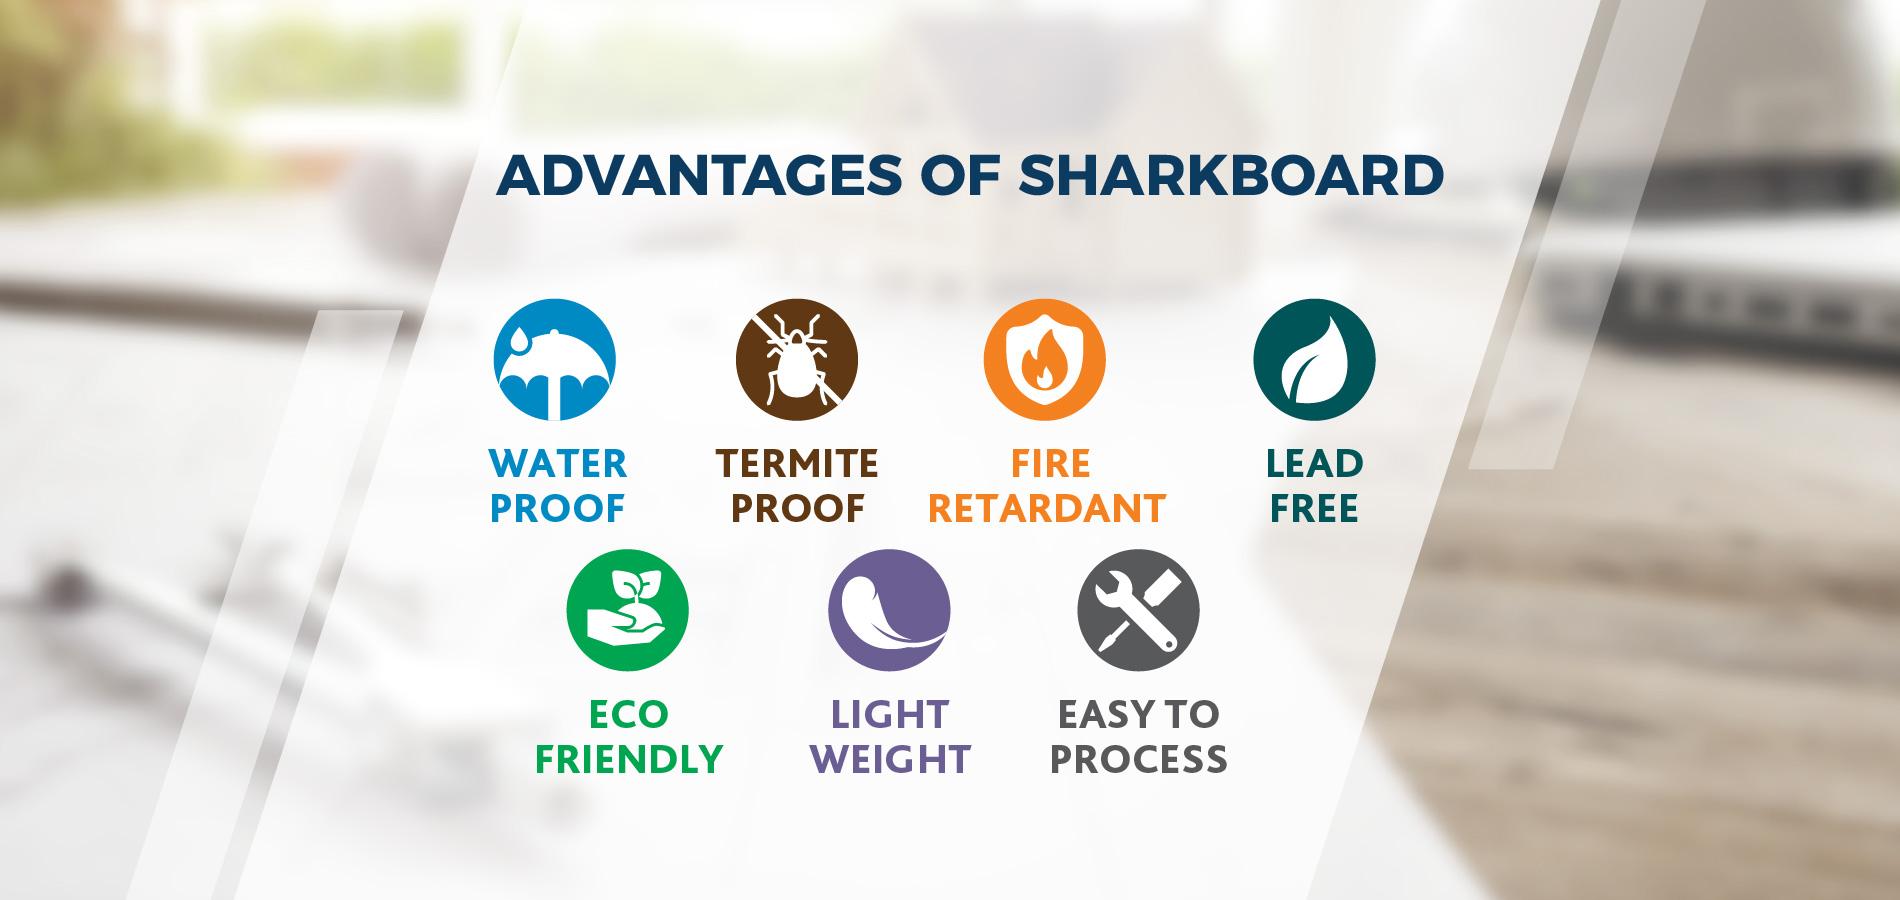 Sharkboard Advantages